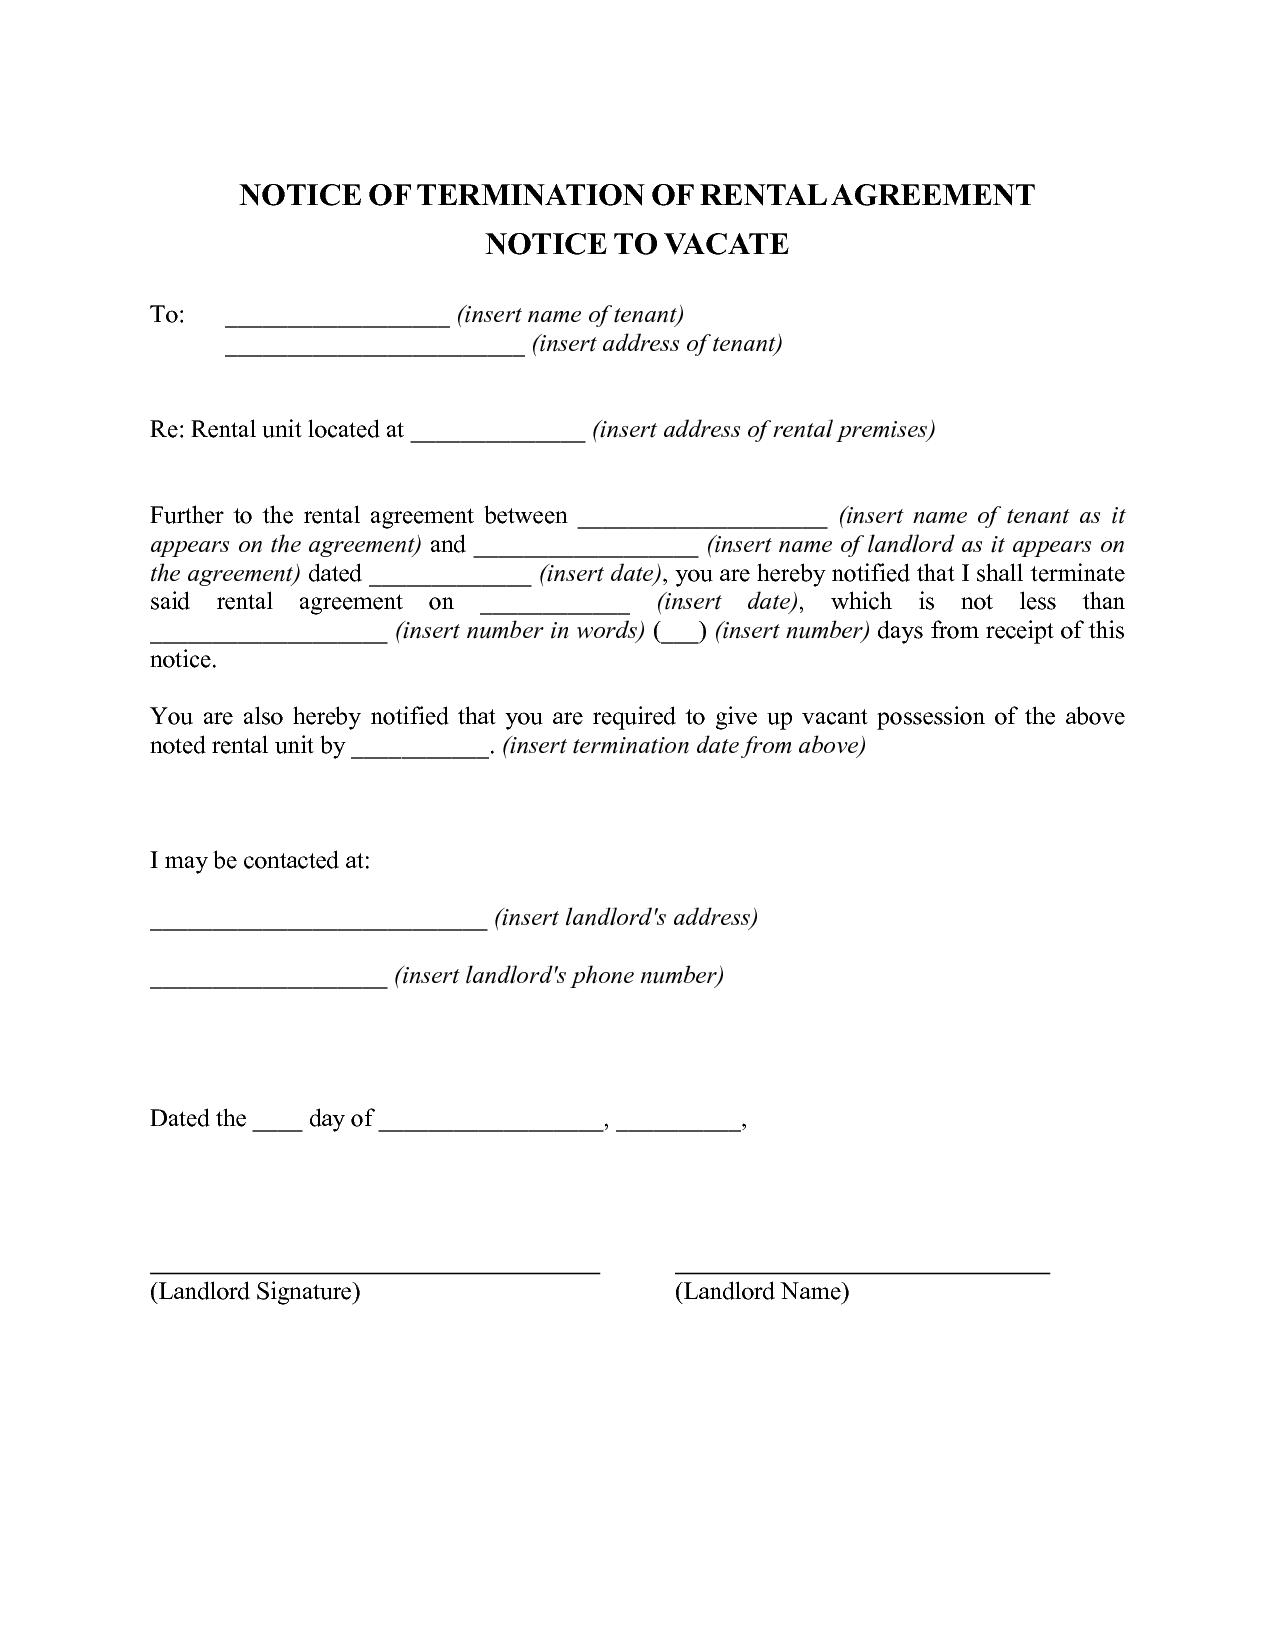 Landlord Notice Letter to Tenant Template - Tenancy Resignation Letter Letter format formal Sample